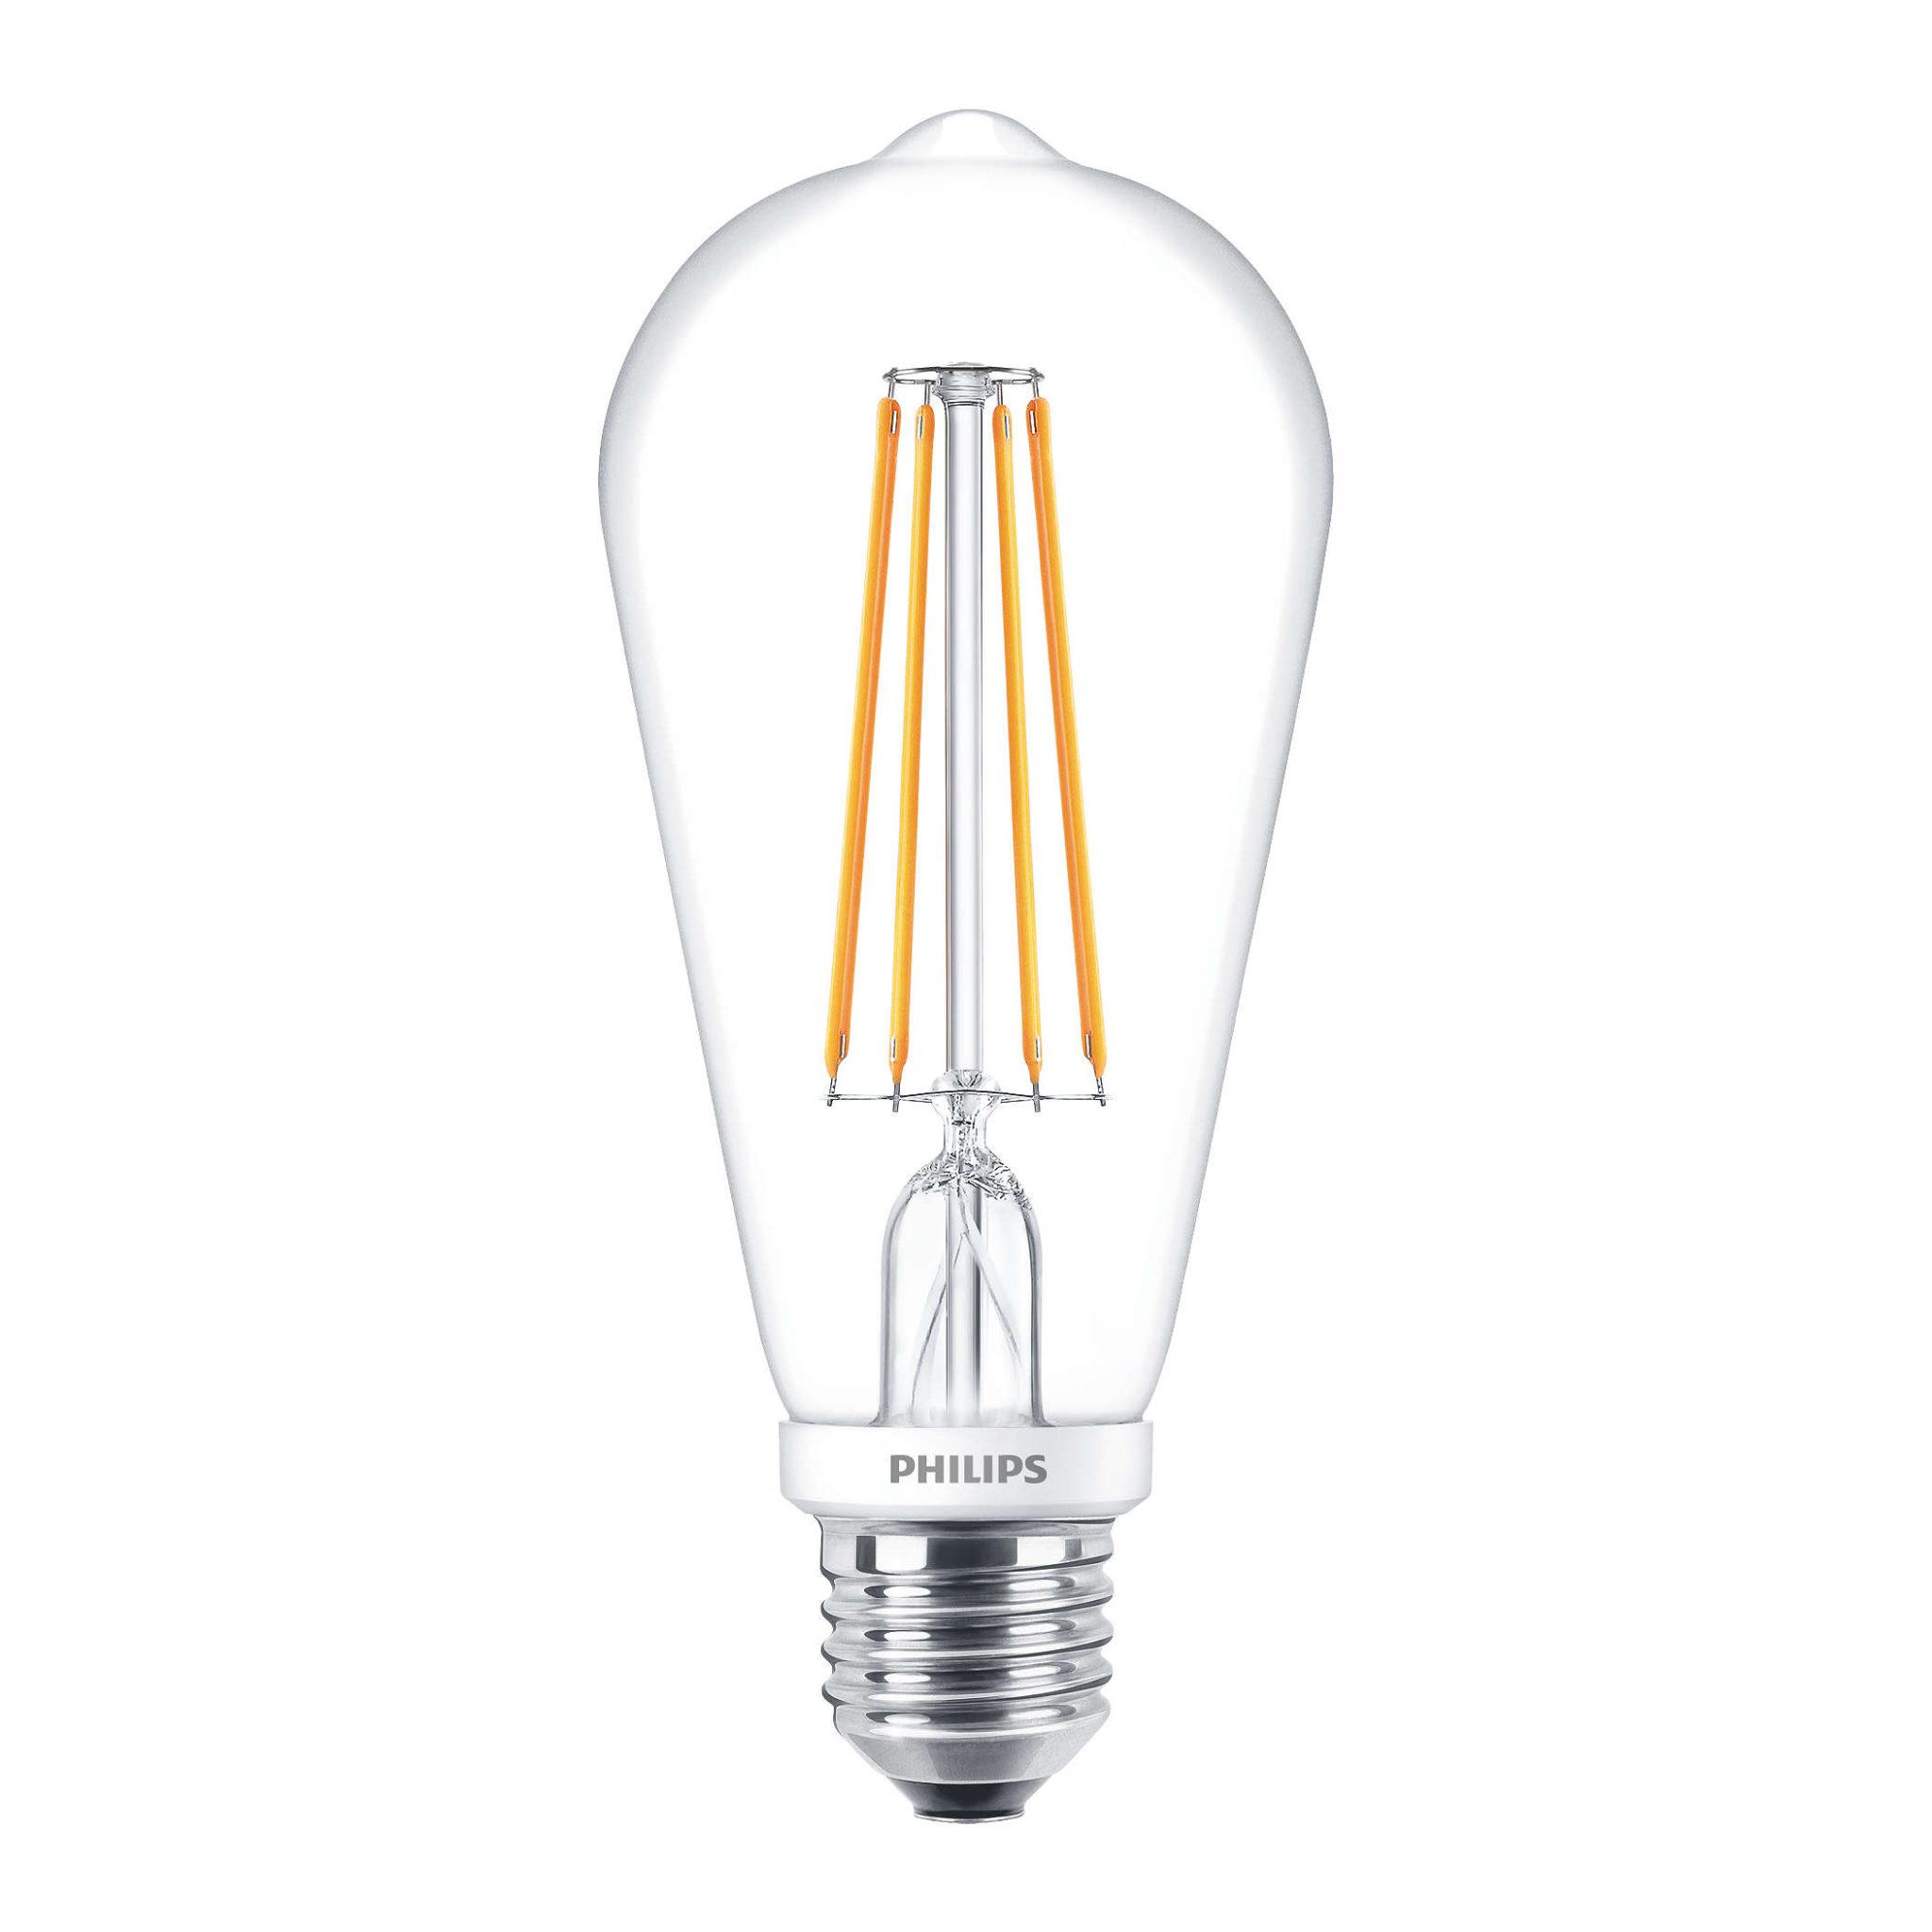 philips large led filament bulb st64 clear e27 7w 2700k. Black Bedroom Furniture Sets. Home Design Ideas